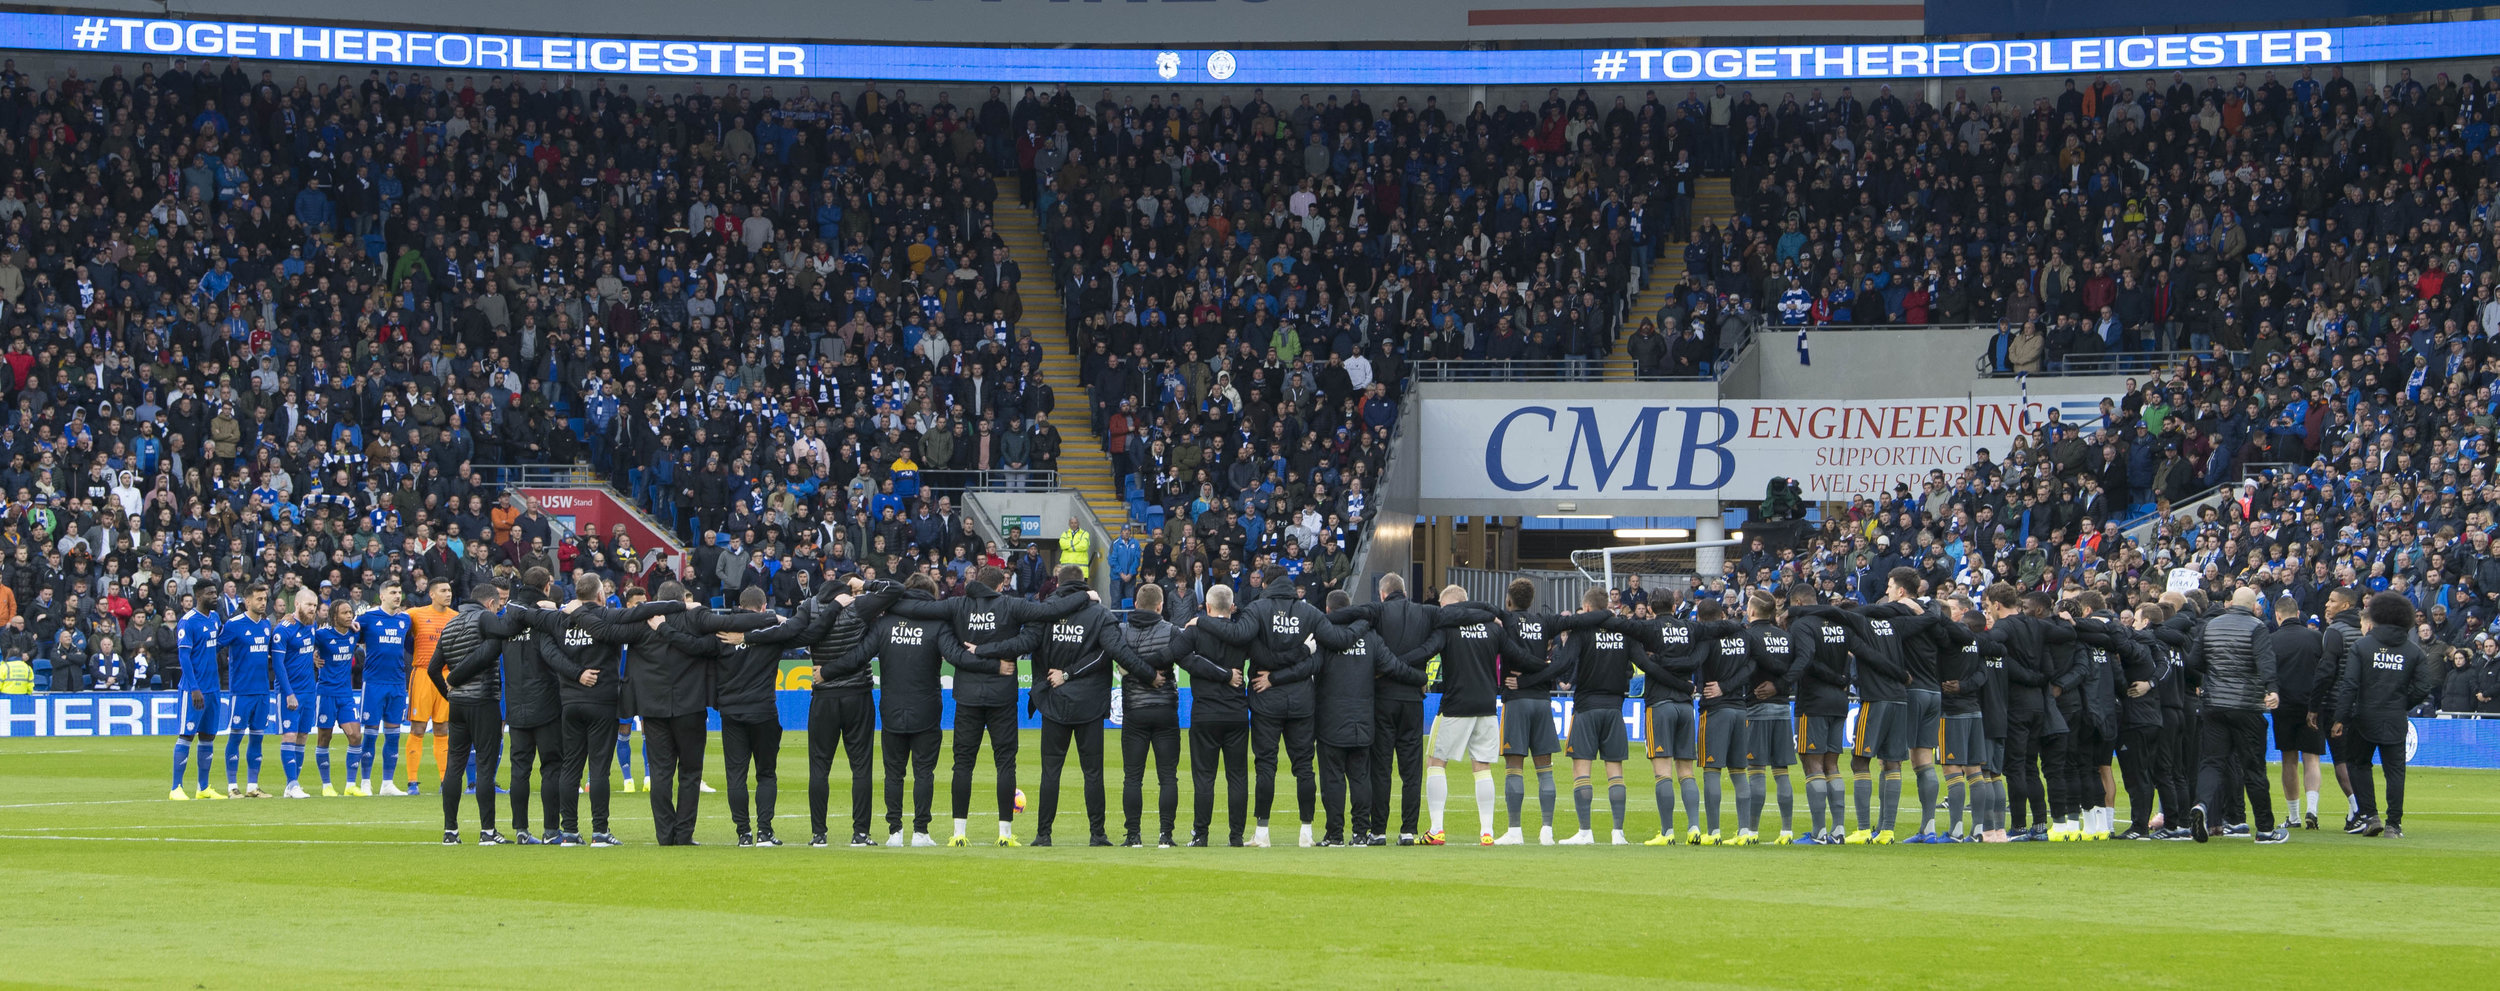 Cardiff_City_Leicester_City